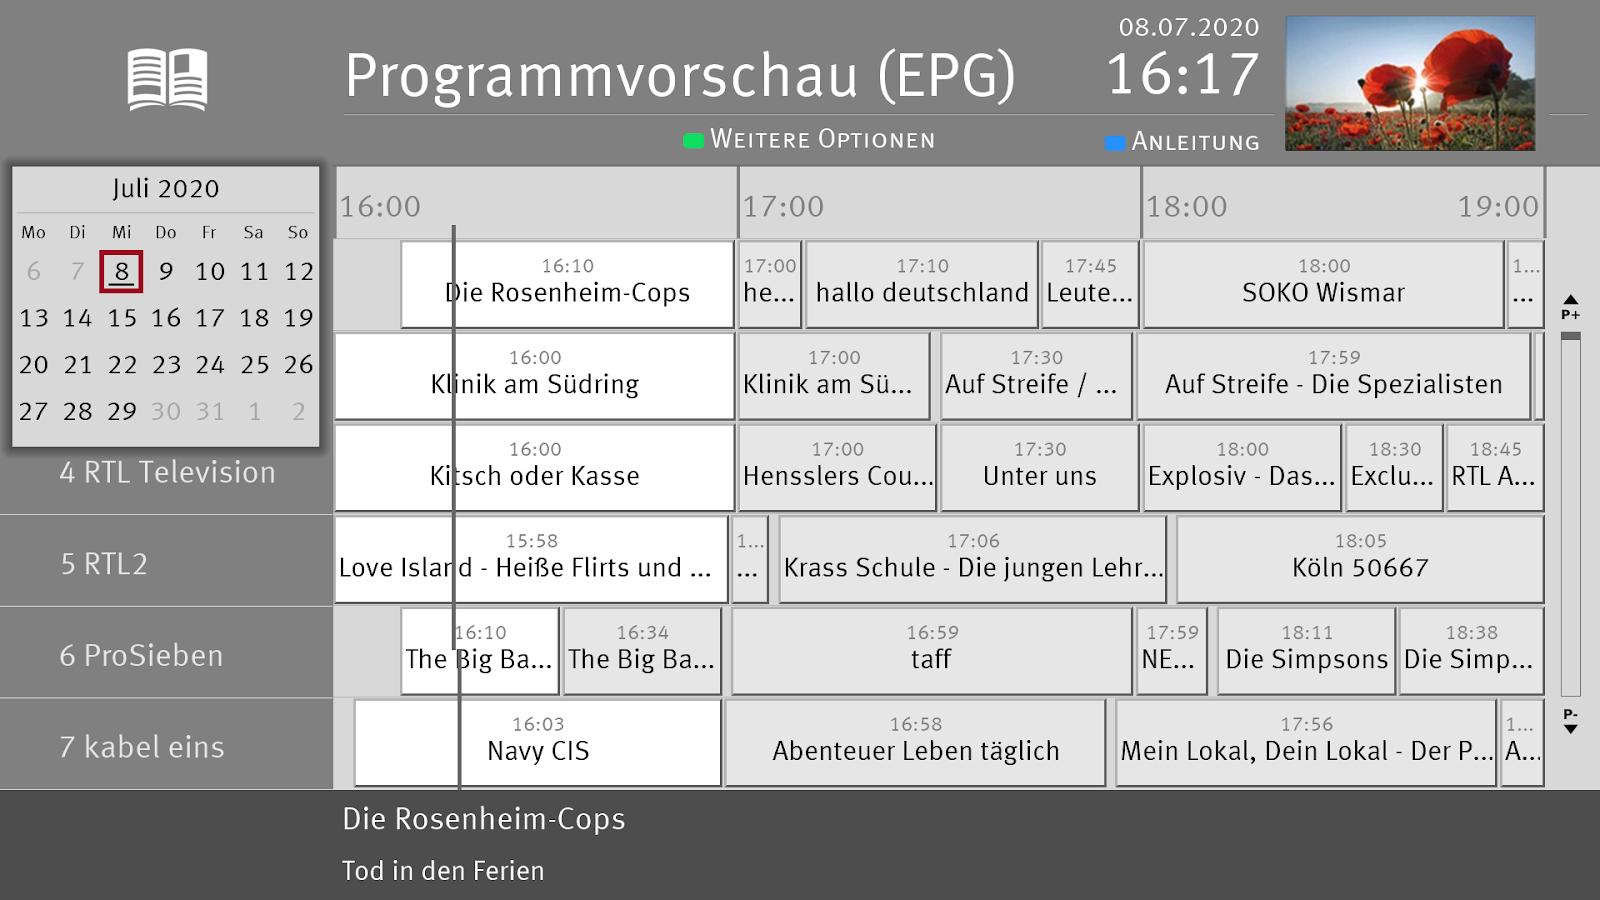 EPG-Screenshot_2020_3_preview